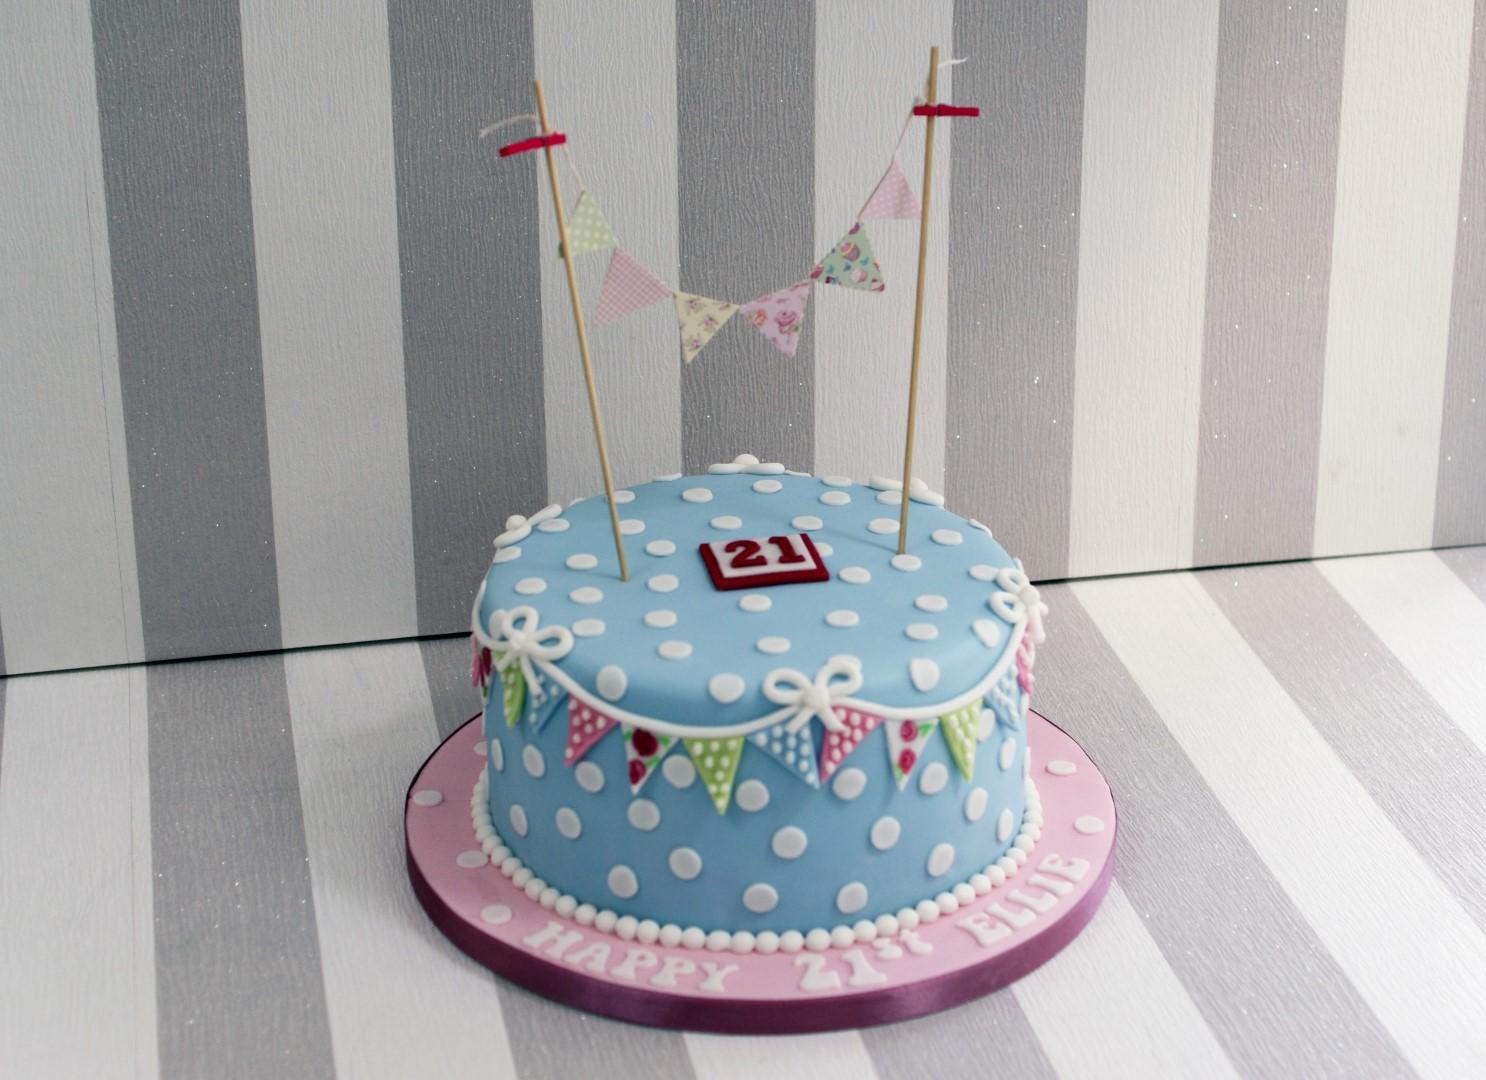 Birthday Cake With Name Zoya ~ Birthday cake in new style ~ image inspiration of cake and birthday